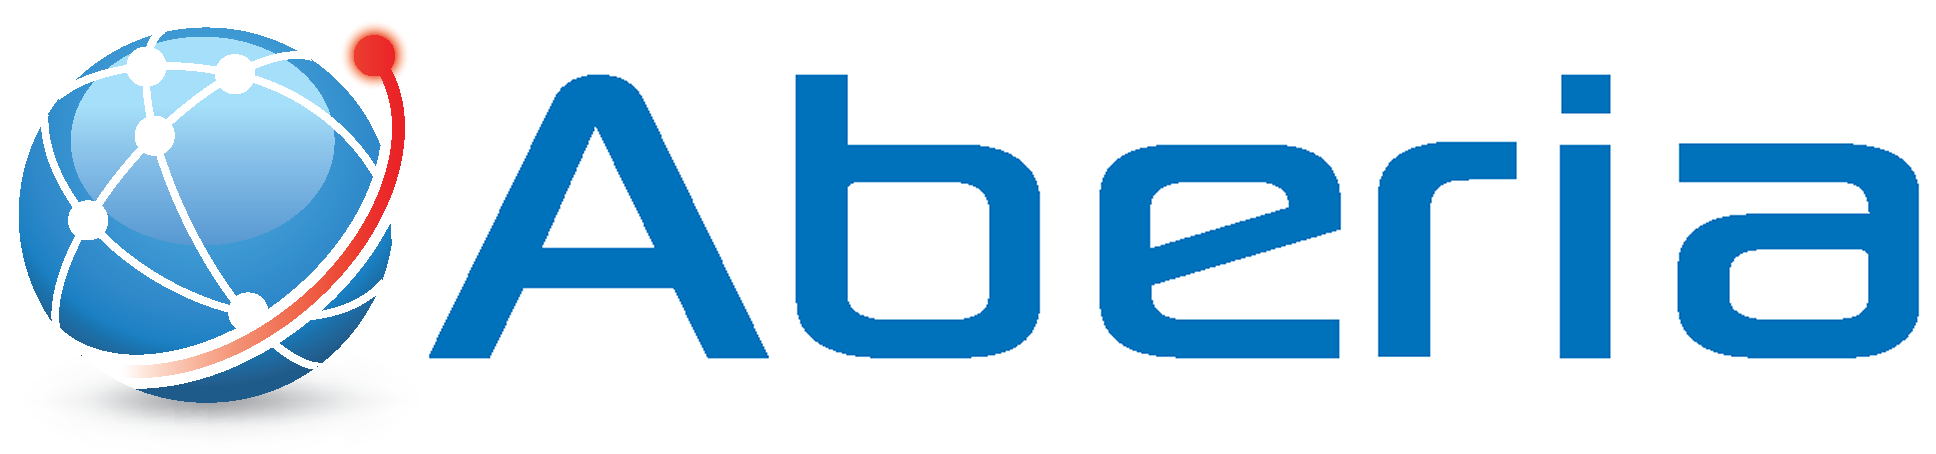 Aberia Telecommunication